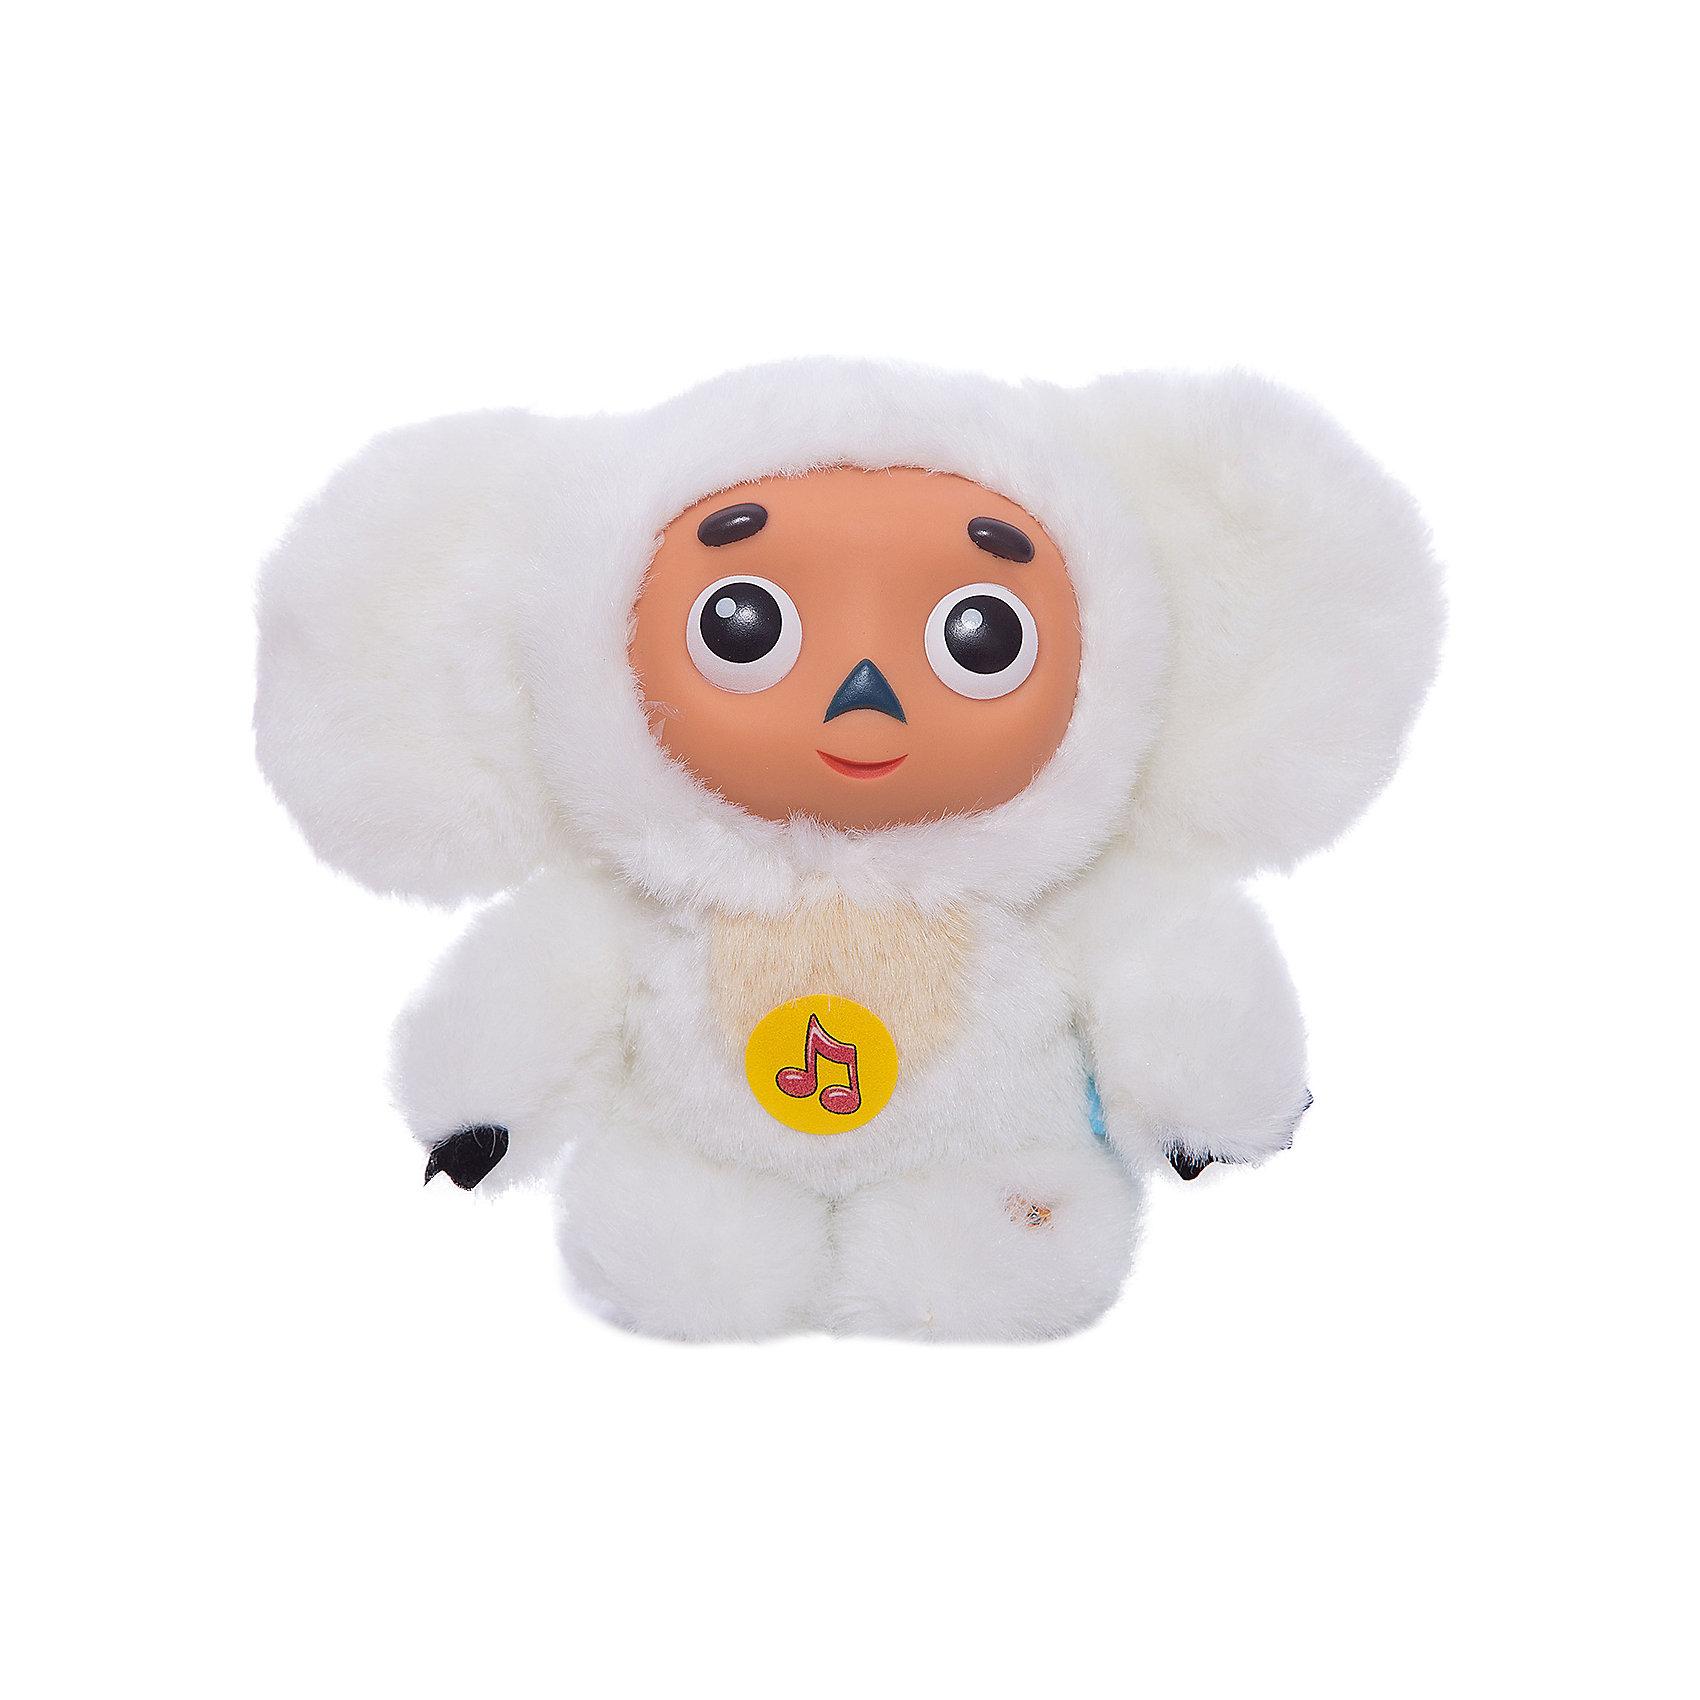 МУЛЬТИ-ПУЛЬТИ Мягкая игрушка Чебурашка, 14 см, МУЛЬТИ-ПУЛЬТИ мульти пульти мягкая игрушка эдди 18 см со звуком пингвиненок пороро мульти пульти